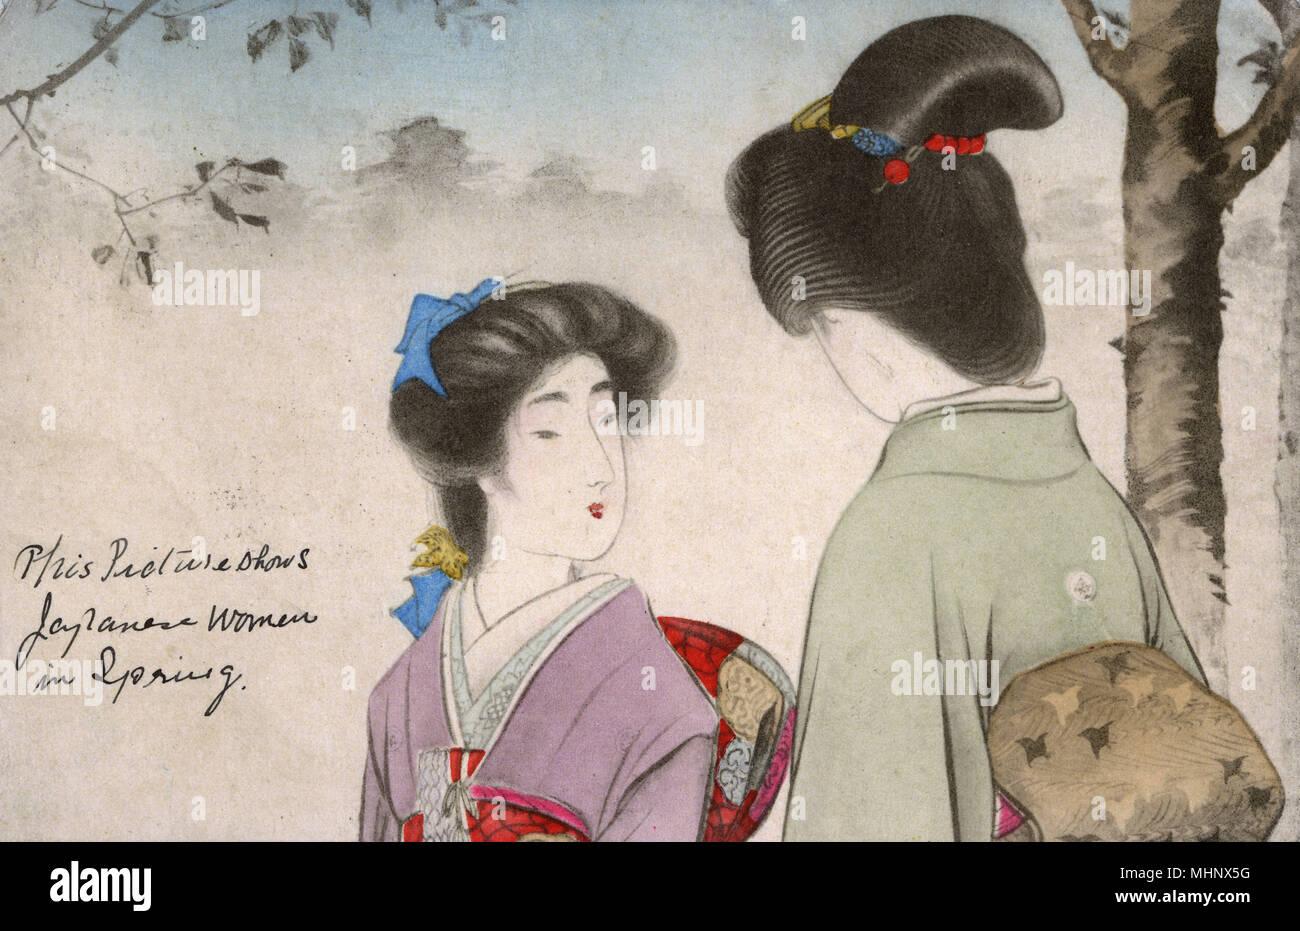 Japan geisha 1900s immagini japan geisha 1900s fotos for Disegni tradizionali giapponesi